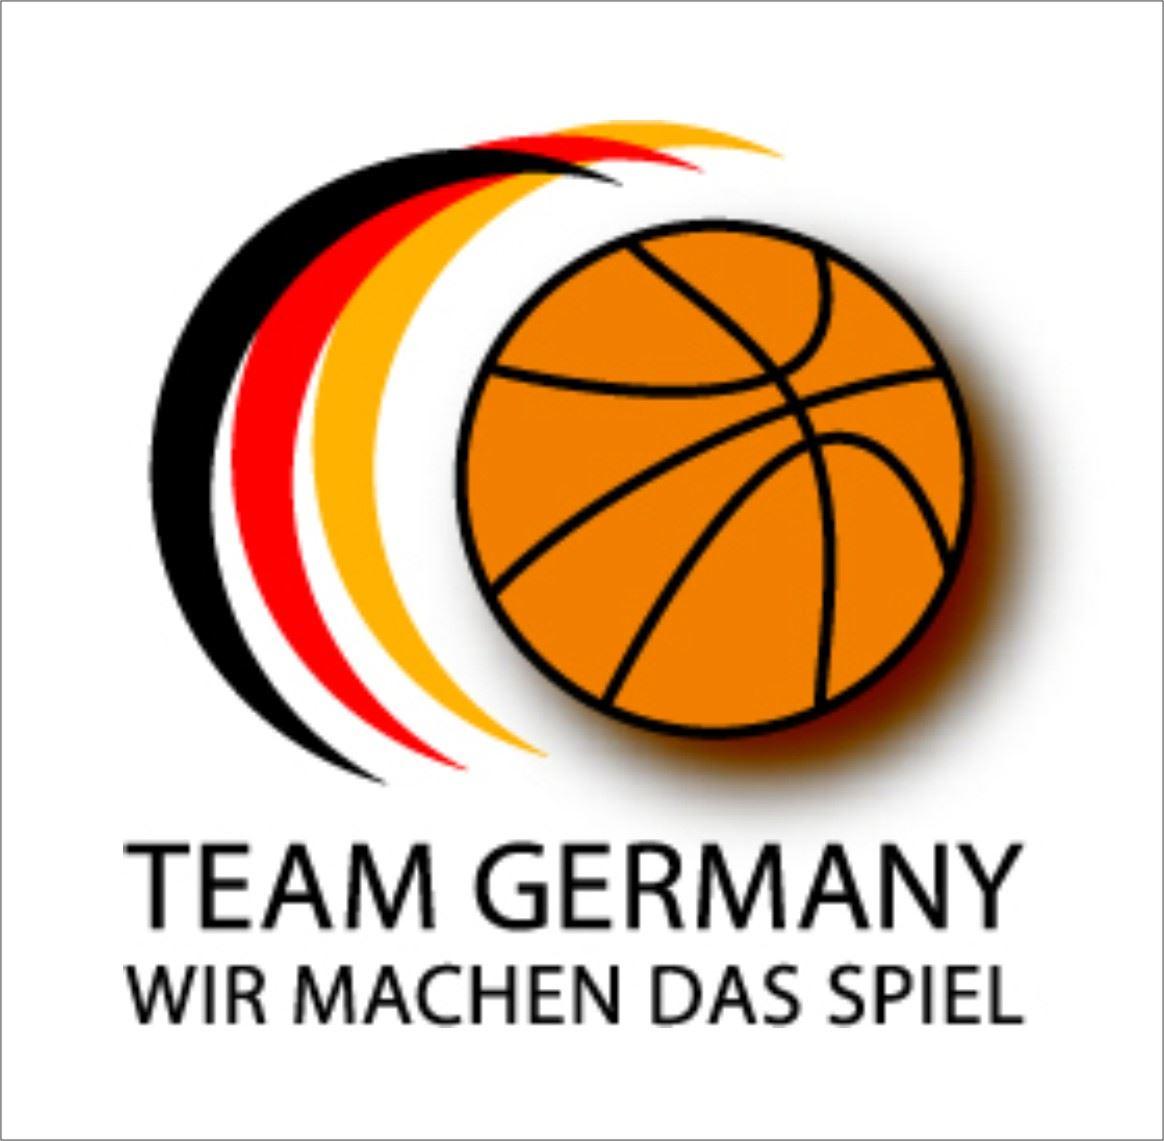 Germany - Germany